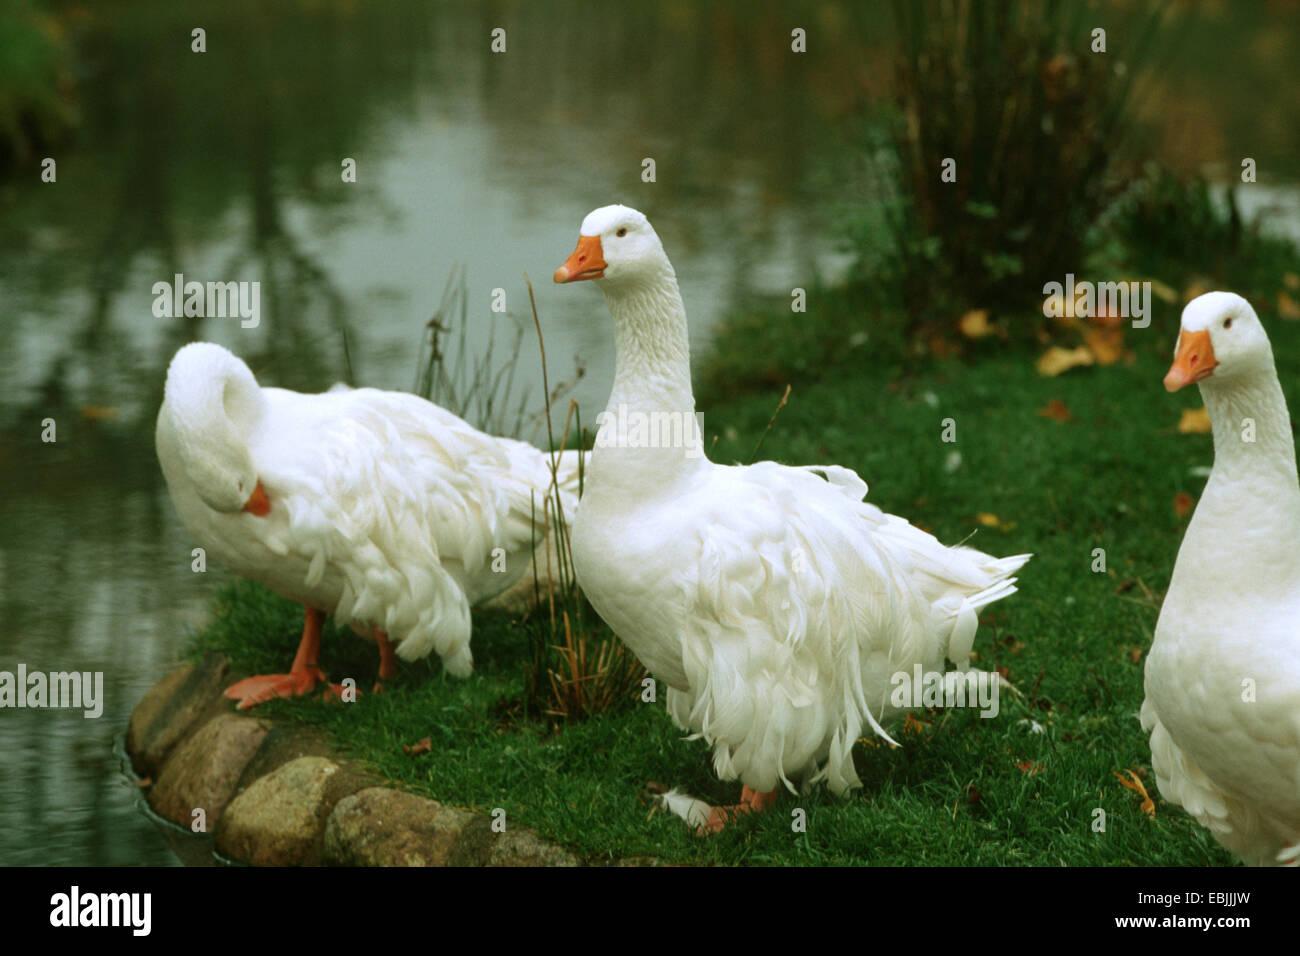 domestic goose (Anser anser f. domestica), some Sebastopol Geese at a lake shore - Stock Image